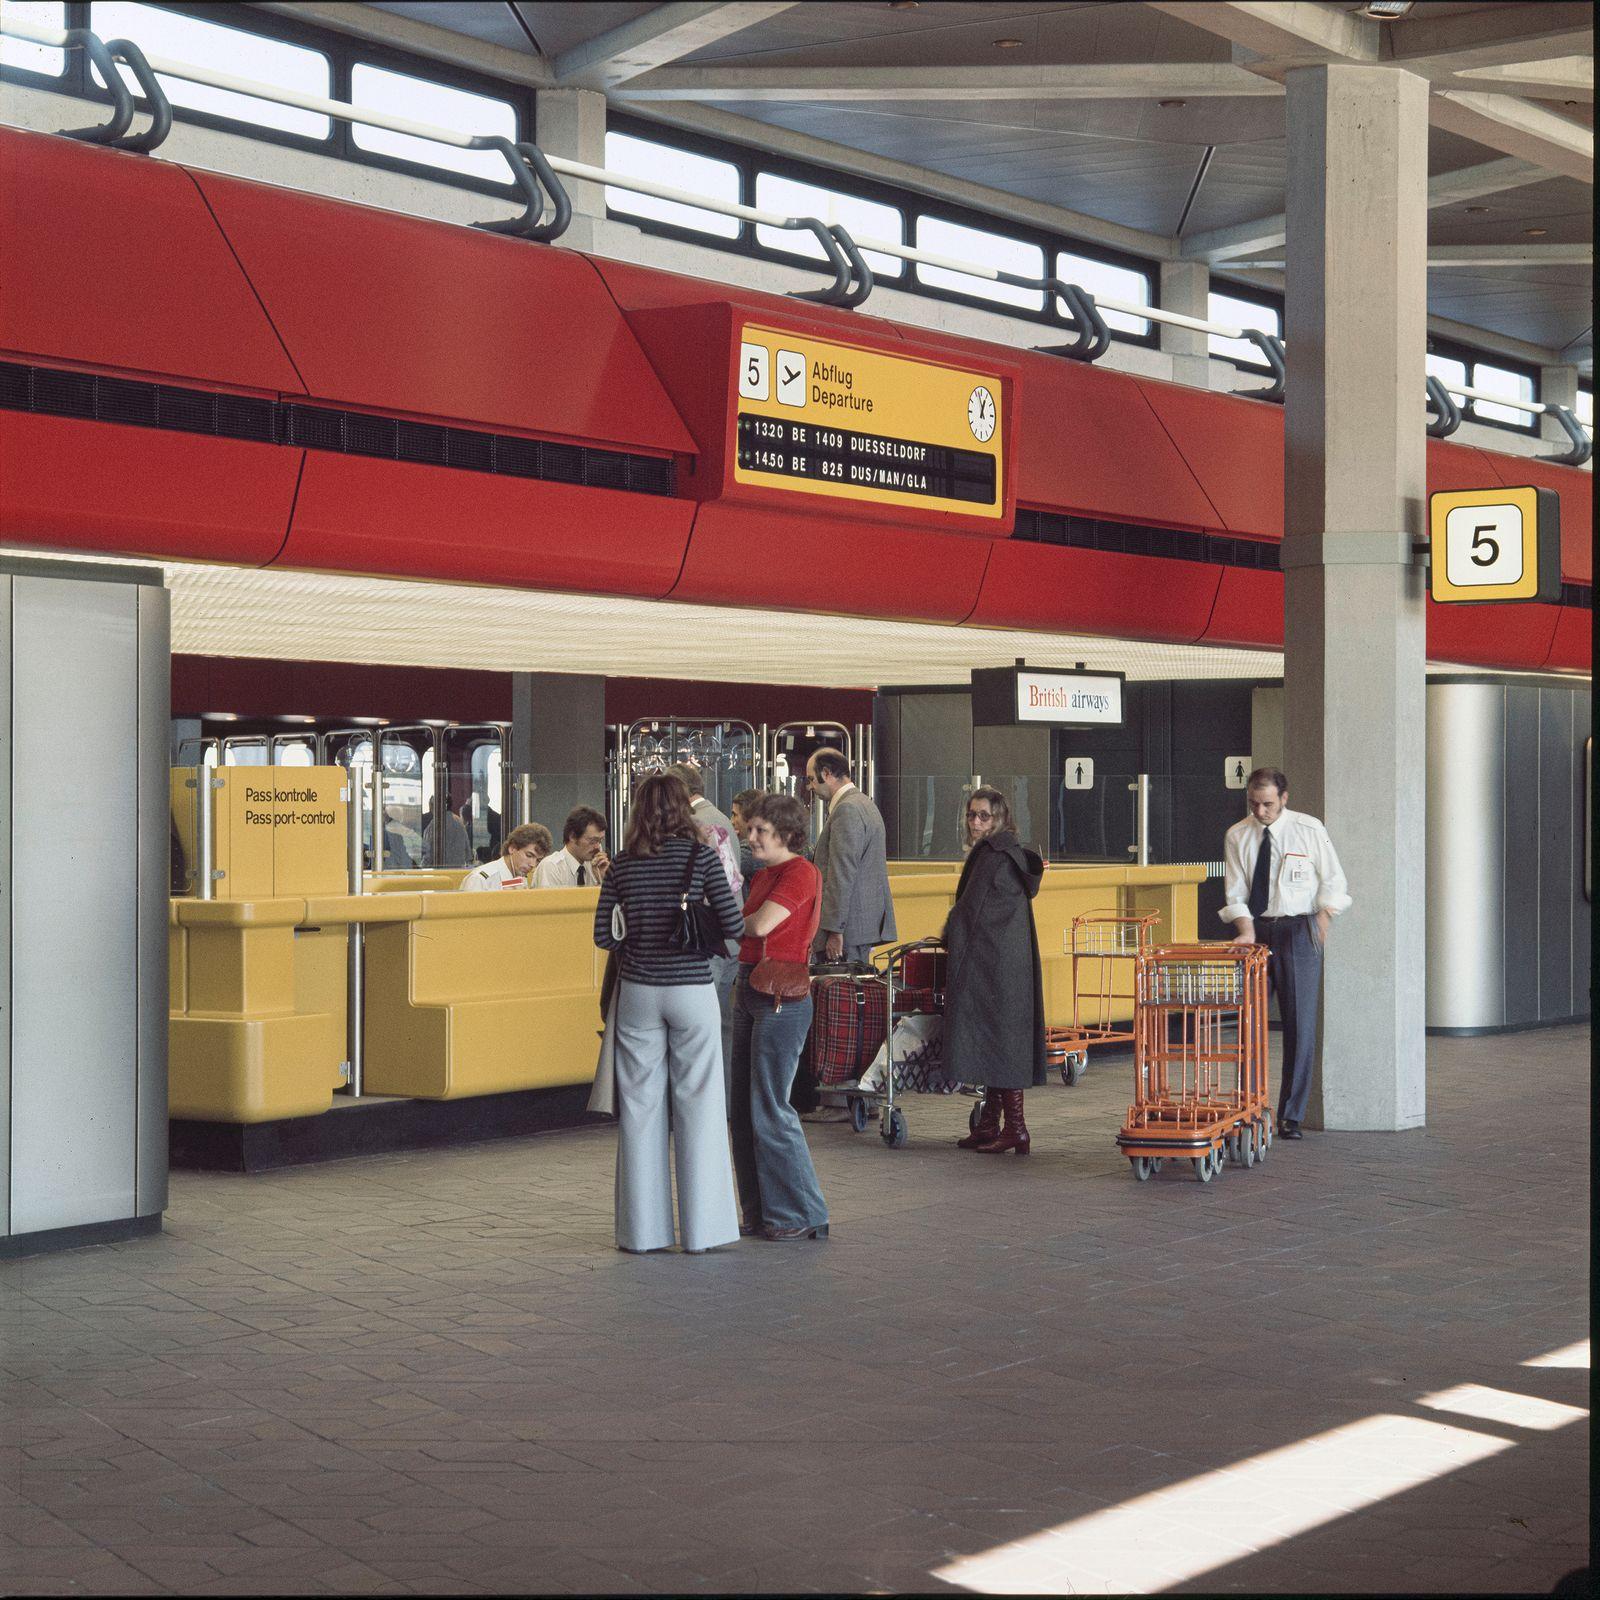 BUCH TXL. Berlin Tegel Airport / Drive to Your Gate / Seite 41, Bild 28